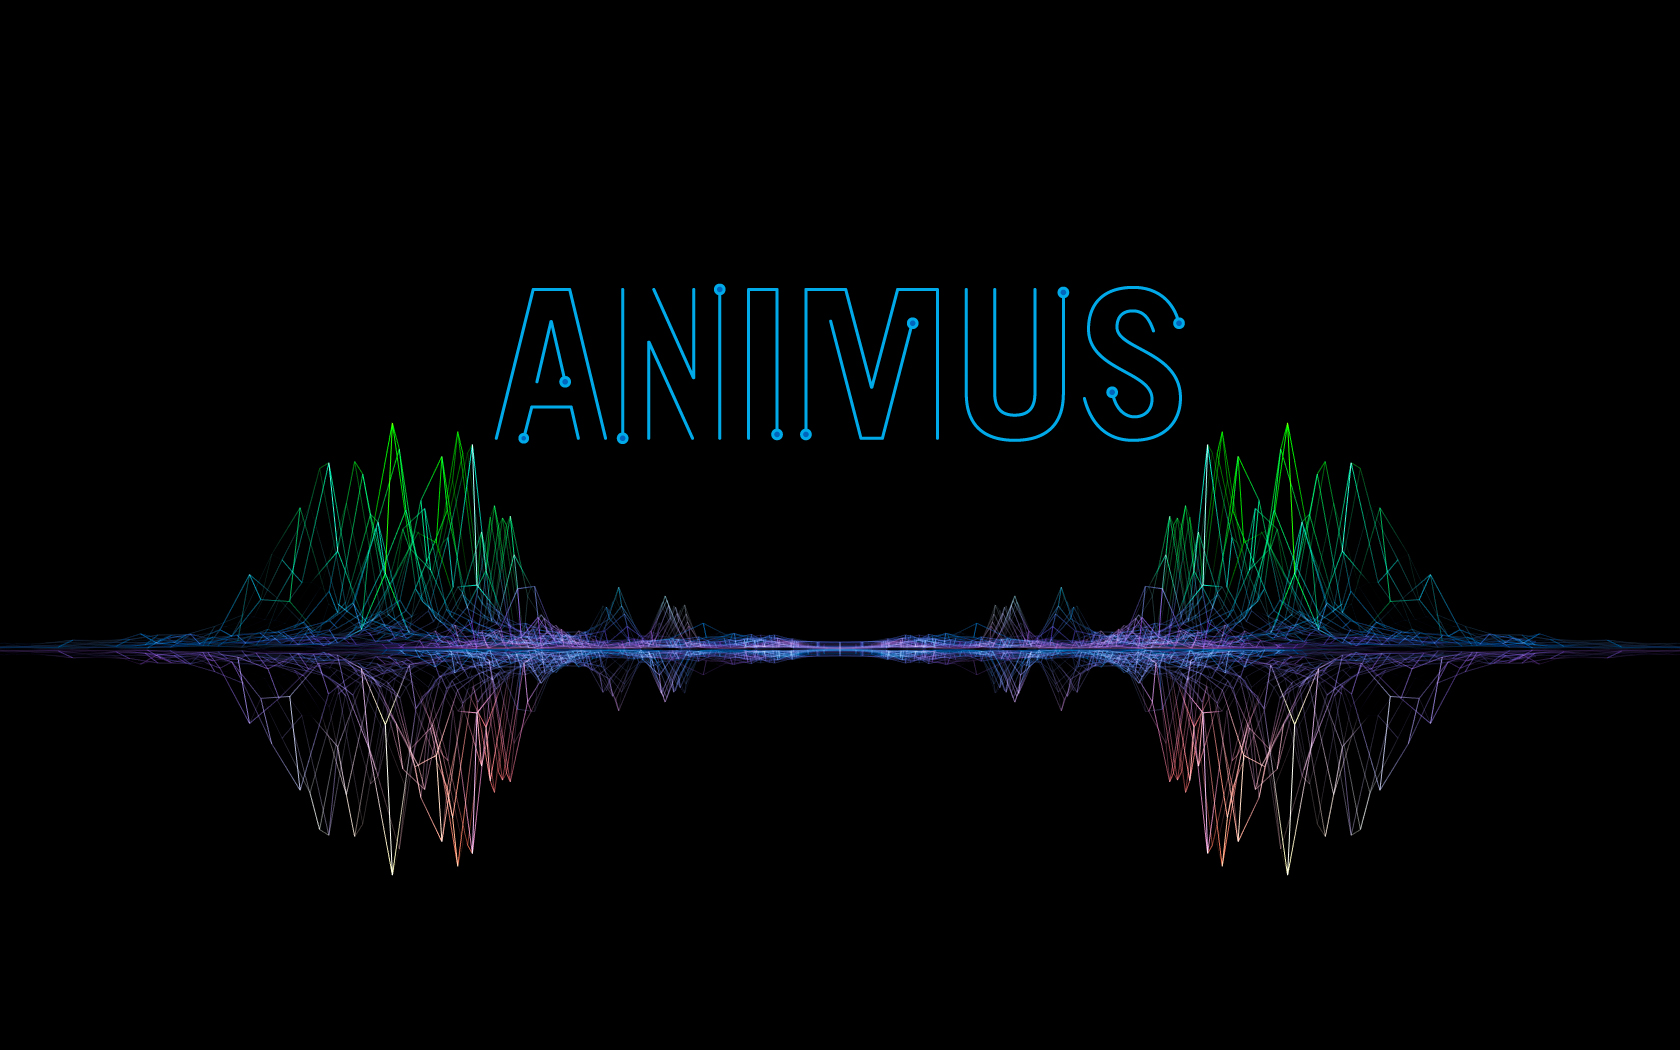 Animus Visualizer